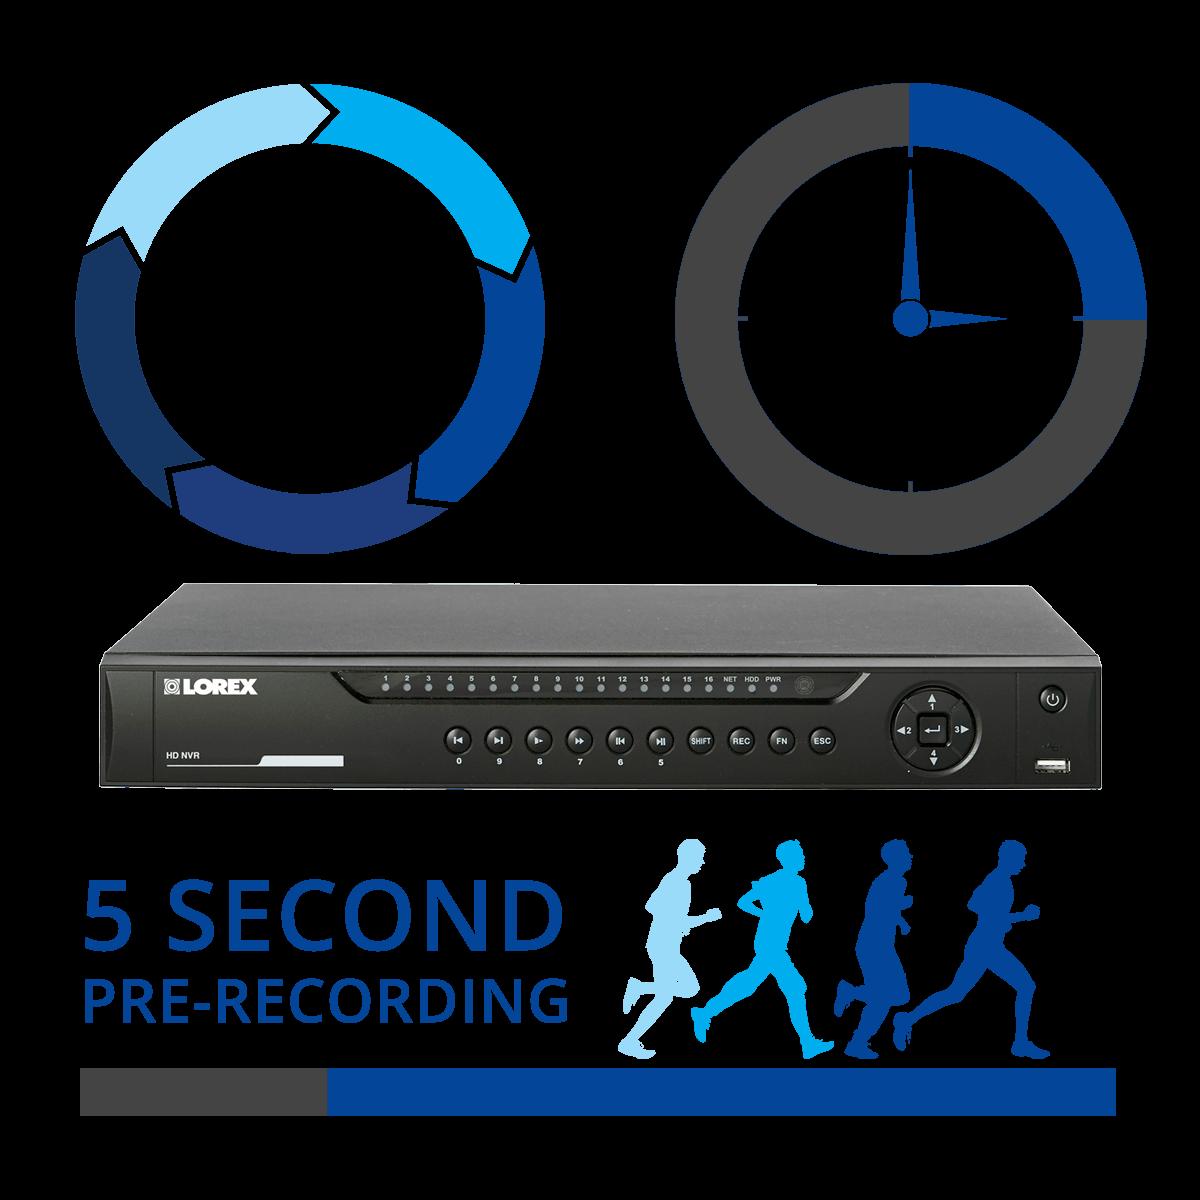 NVR security camera Recording modes